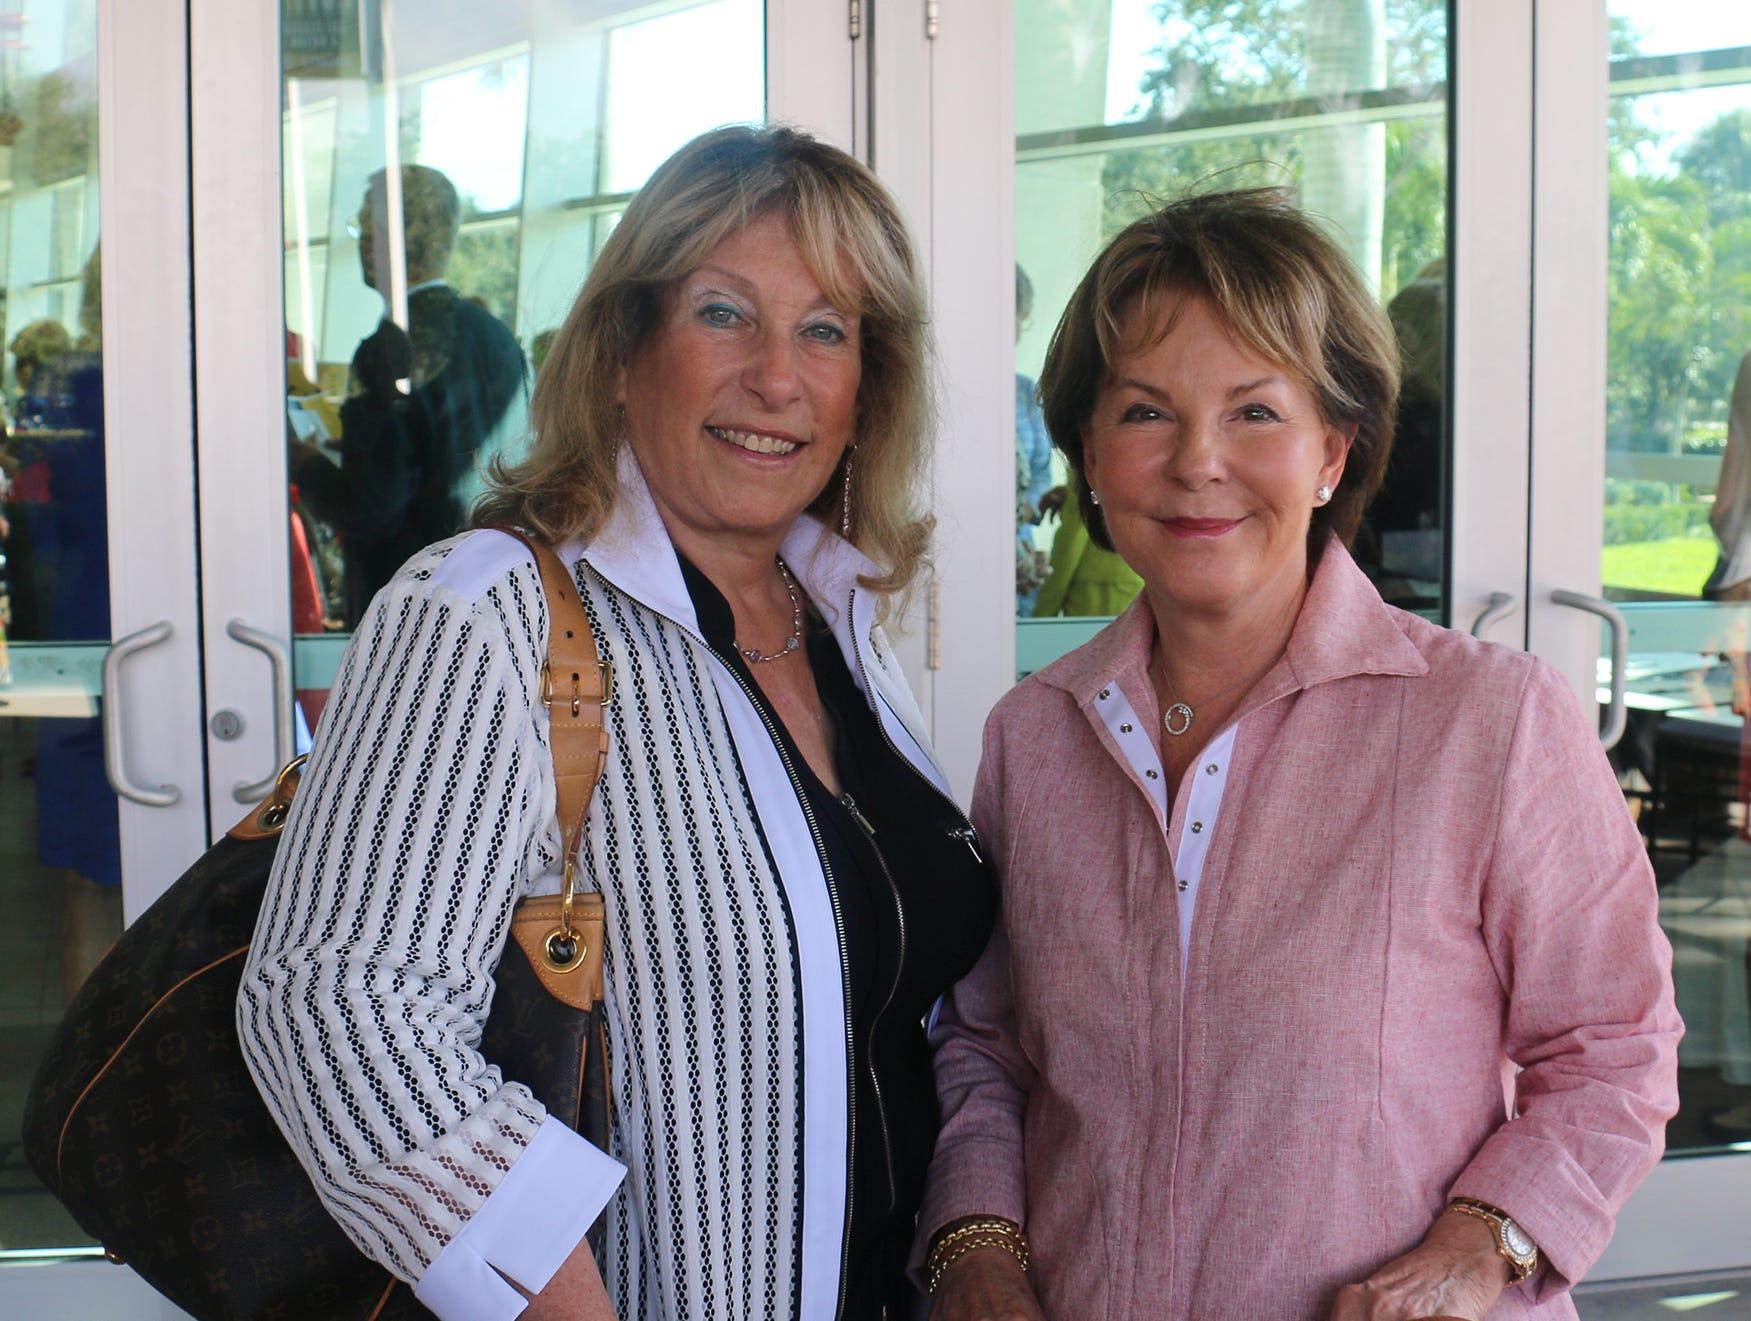 Bobbie Holt and Barbara Leigh